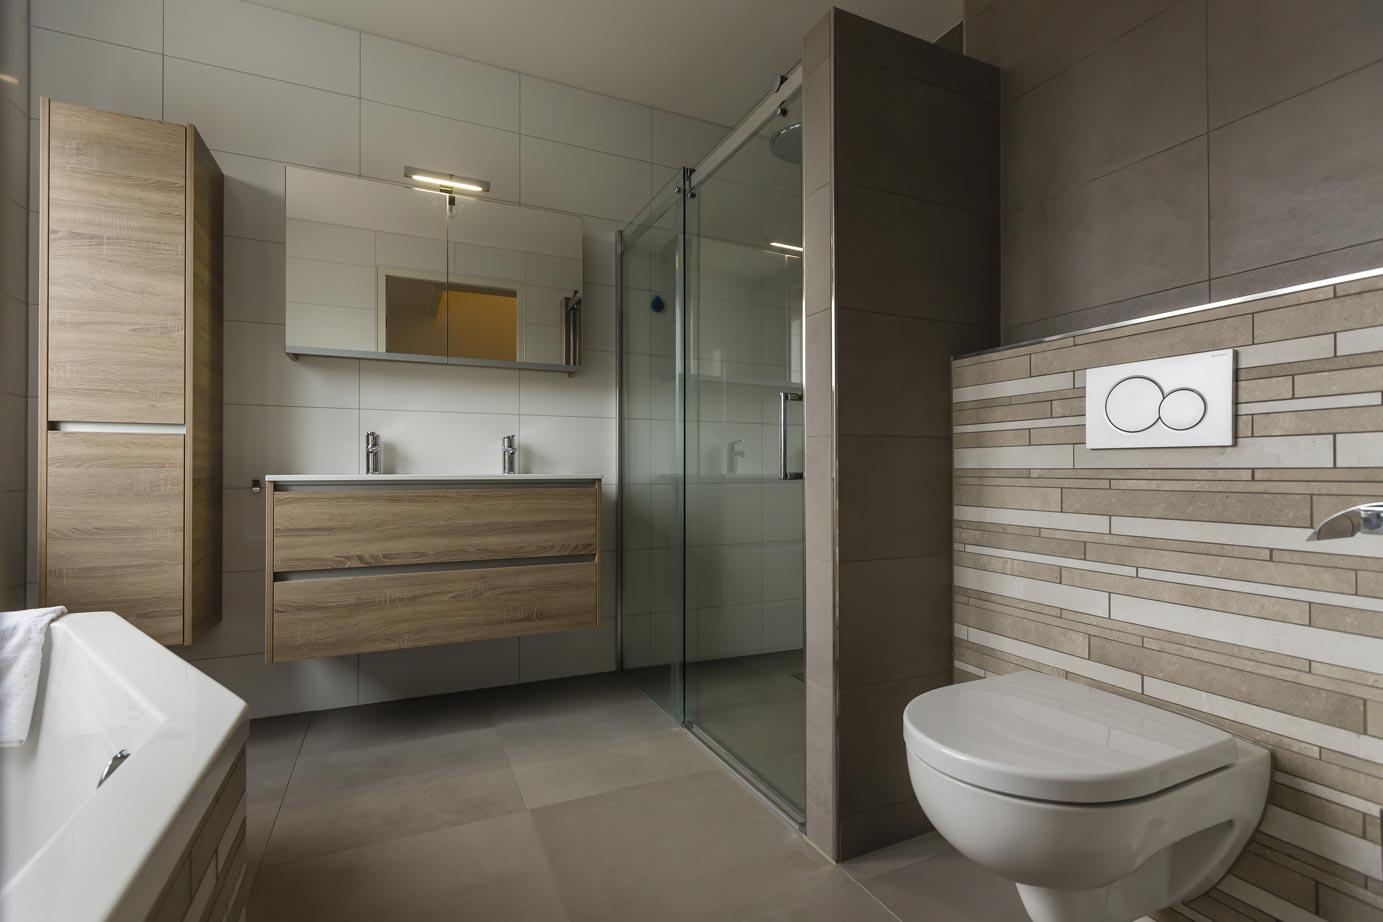 Gamma Badkamer Rolgordijn : Tegels verven badkamer gamma: tegelverf grijs stunning tegelverf